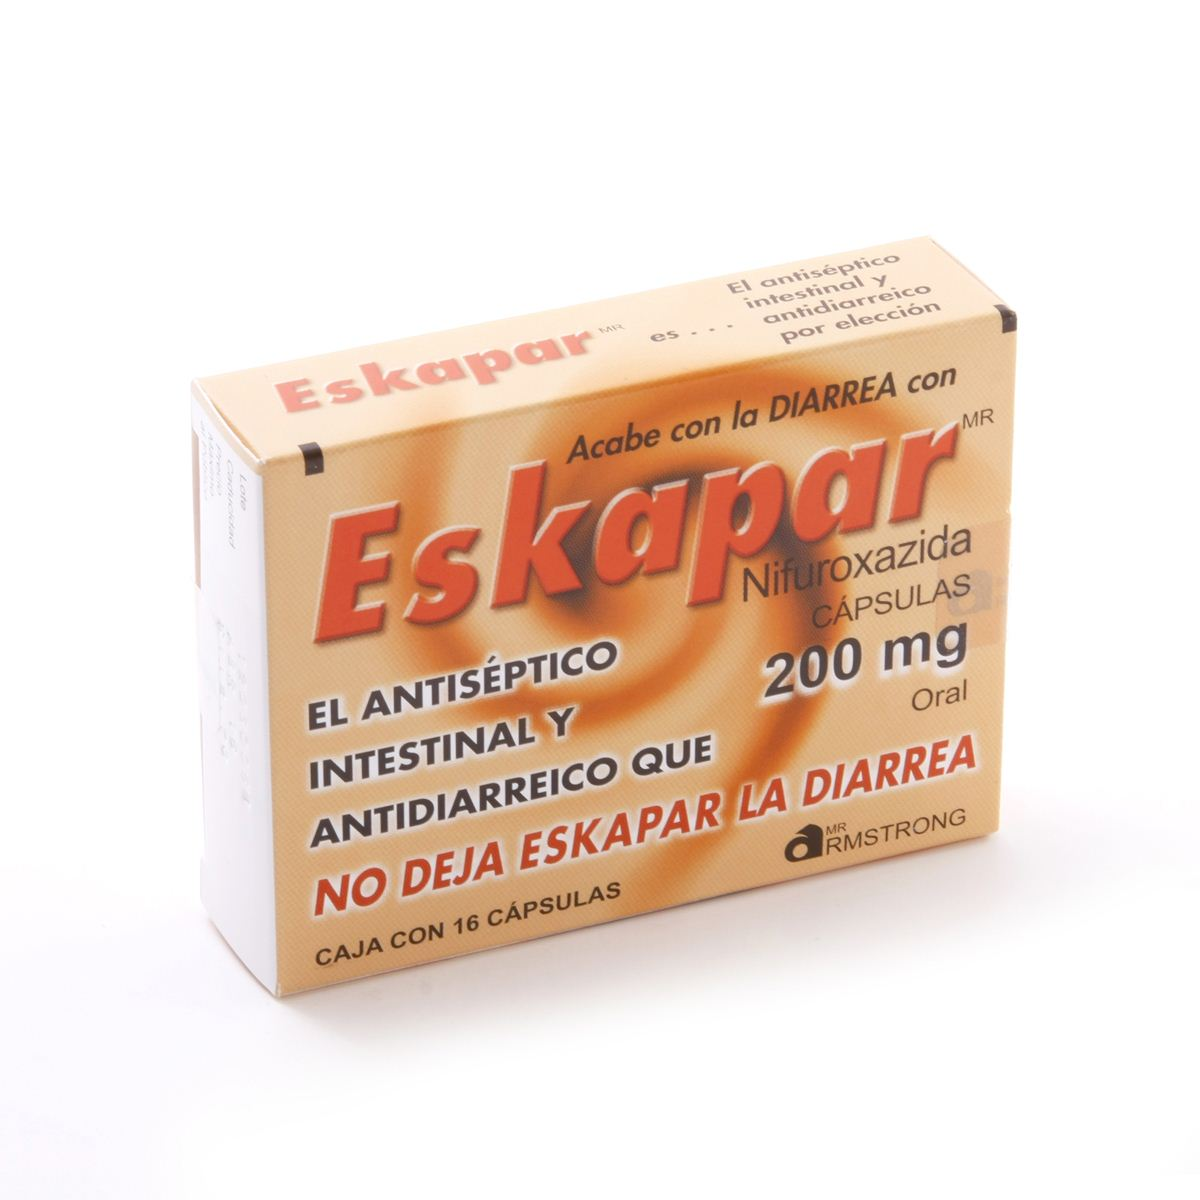 Eskapar con 16 cápsulas 200 mg  - Sanborns